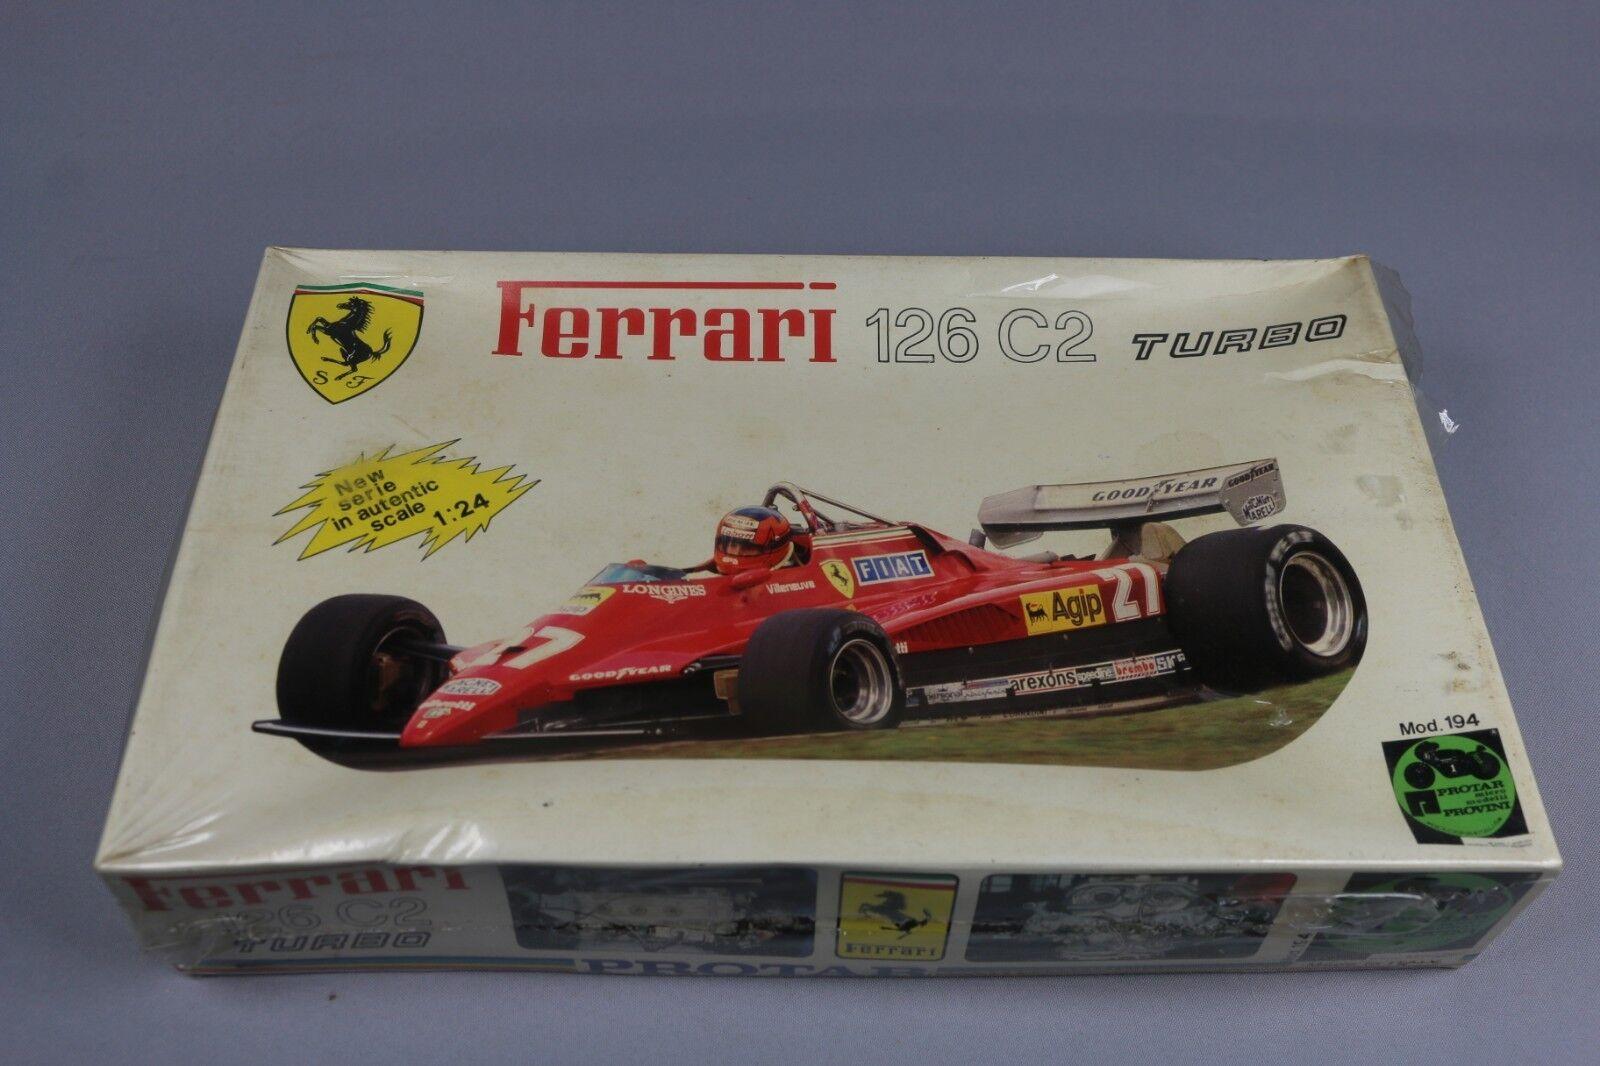 Zf1324 Protar 1 24 Model Car 194 Ferrari 126 C2 Turbo Villeneuve  27